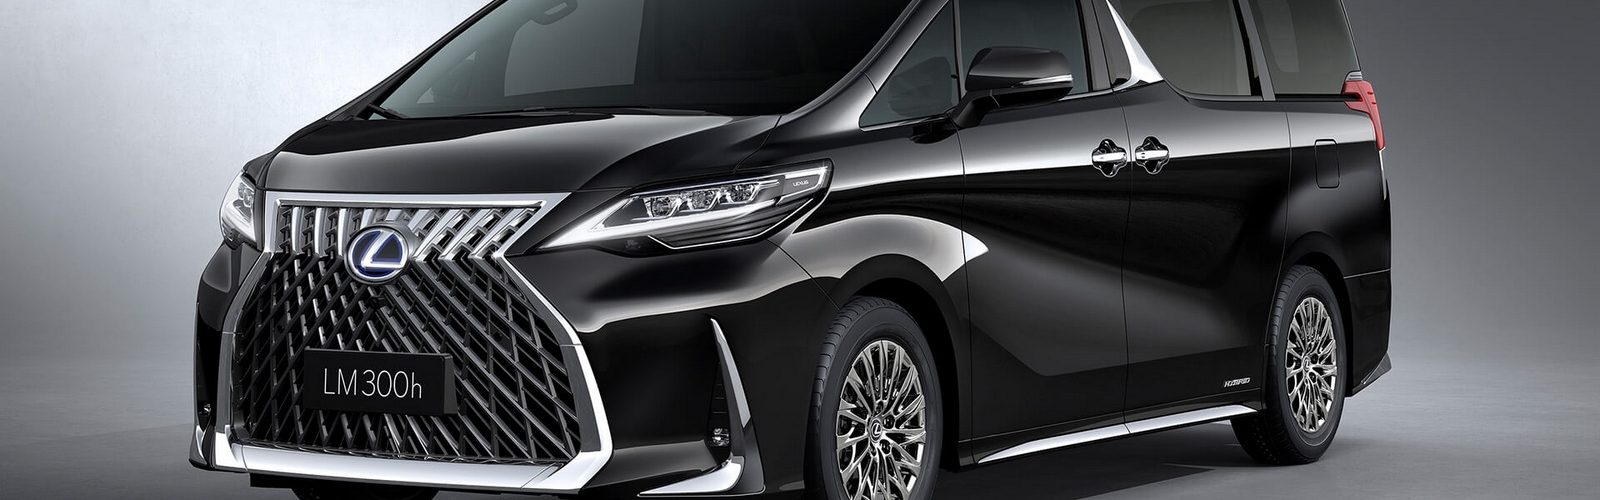 Lexus LM LNA 04